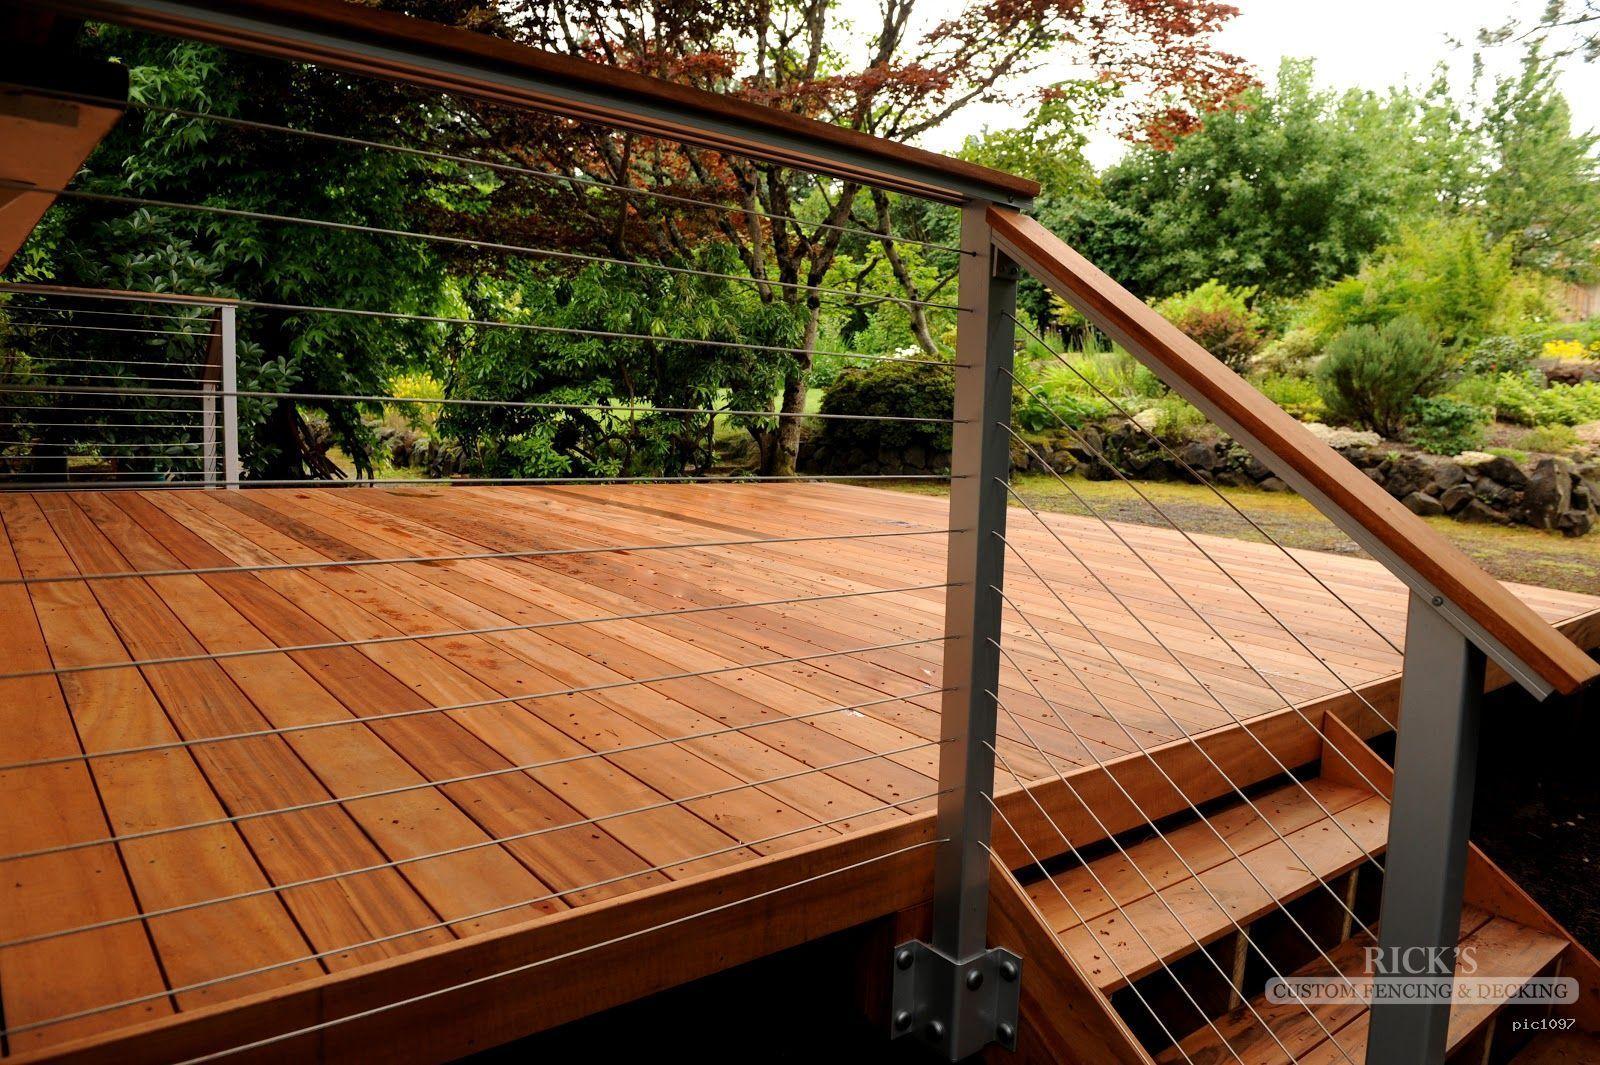 Tigerwood Decking | Rick's Custom Fencing & Decking | The ...